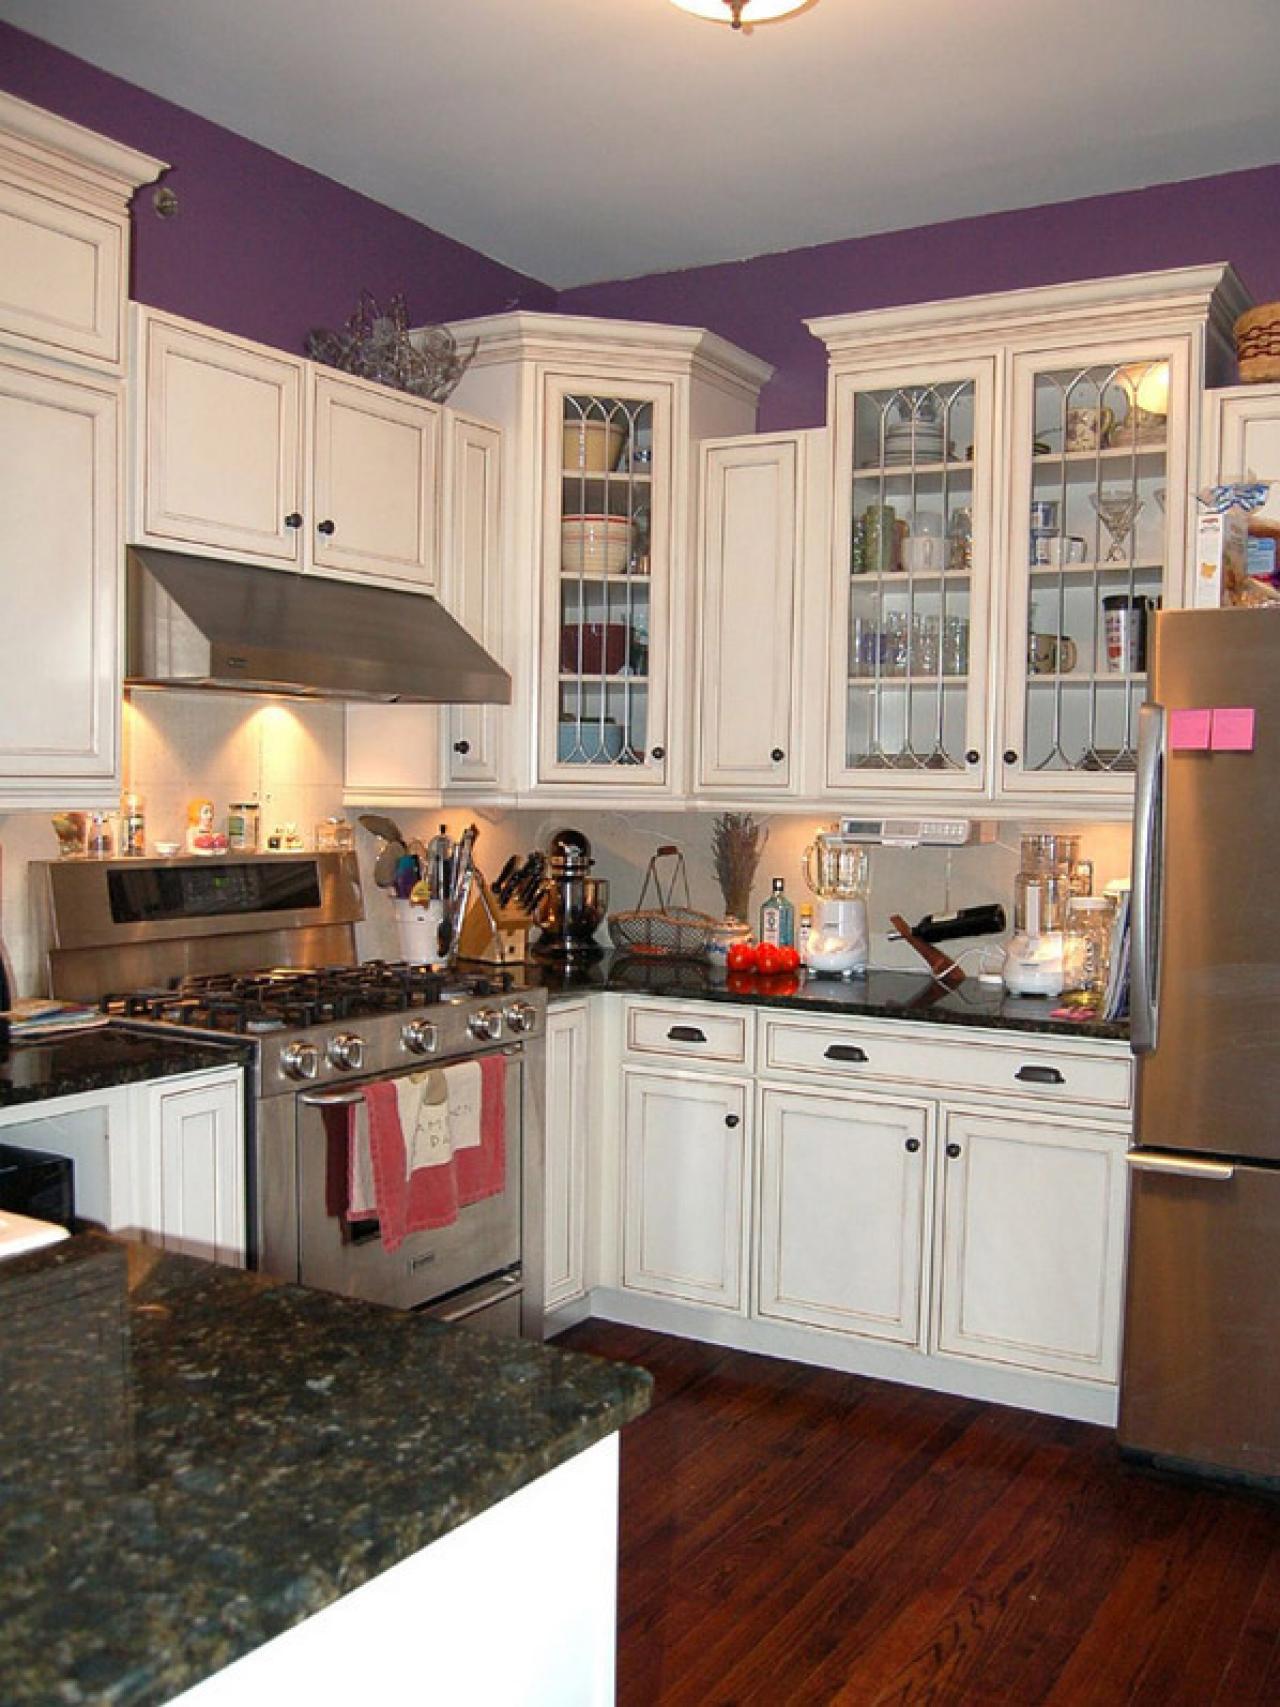 original_kitchen-hvide-kabinetter-lilla-walls_s3x4-jpg-rend-hgtvcom-1280-1707